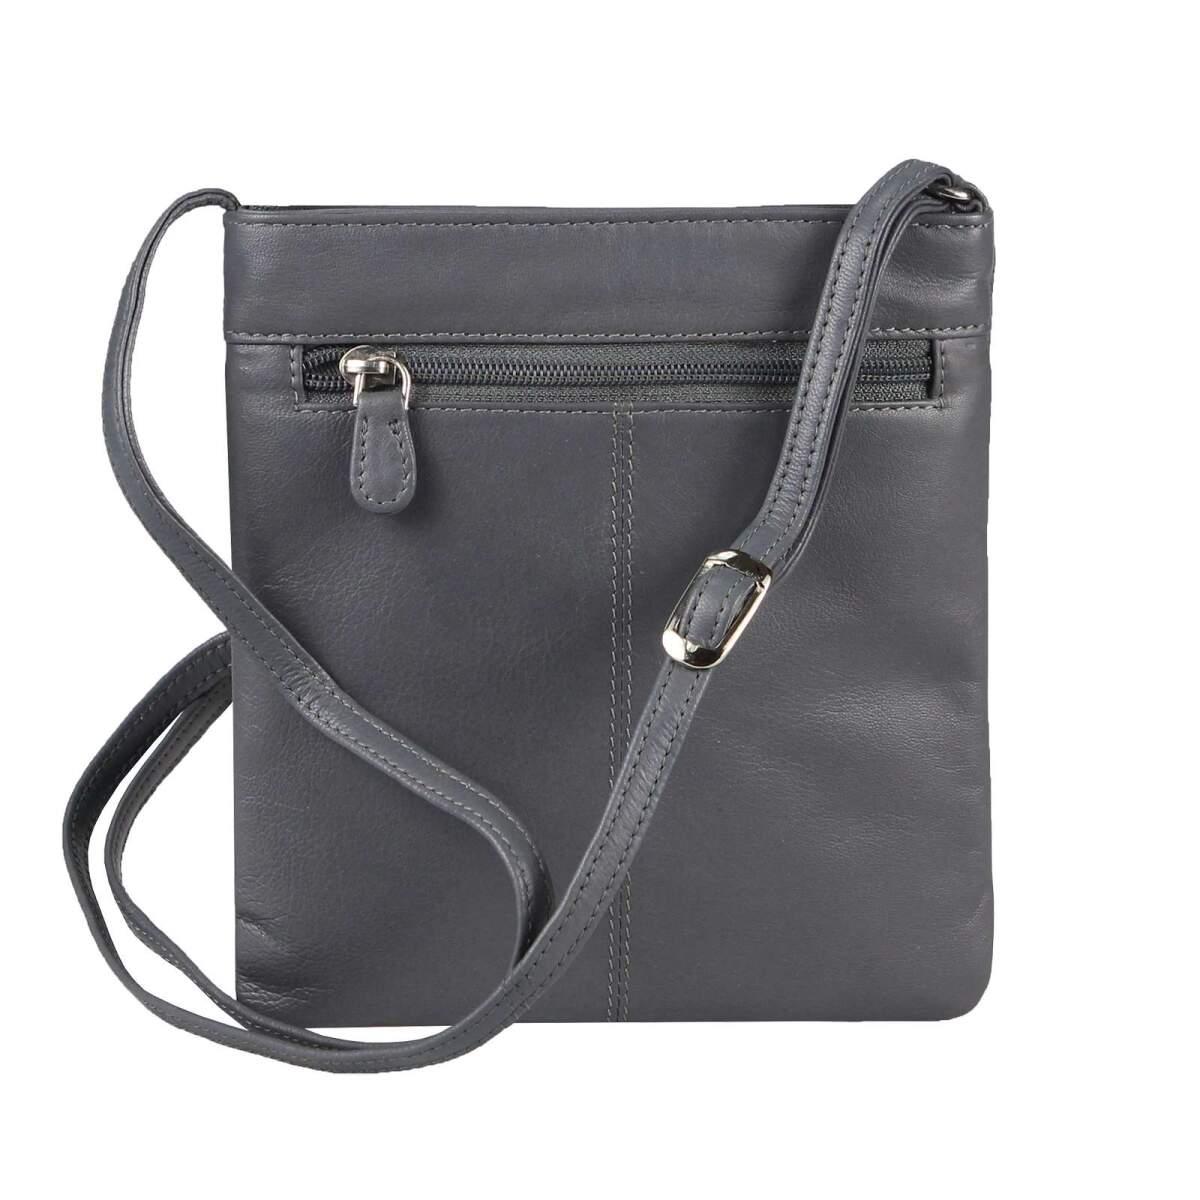 OBC Damen Leder Tasche Crossbody Handtasche Umhängetasche JJ6124.DuGrau